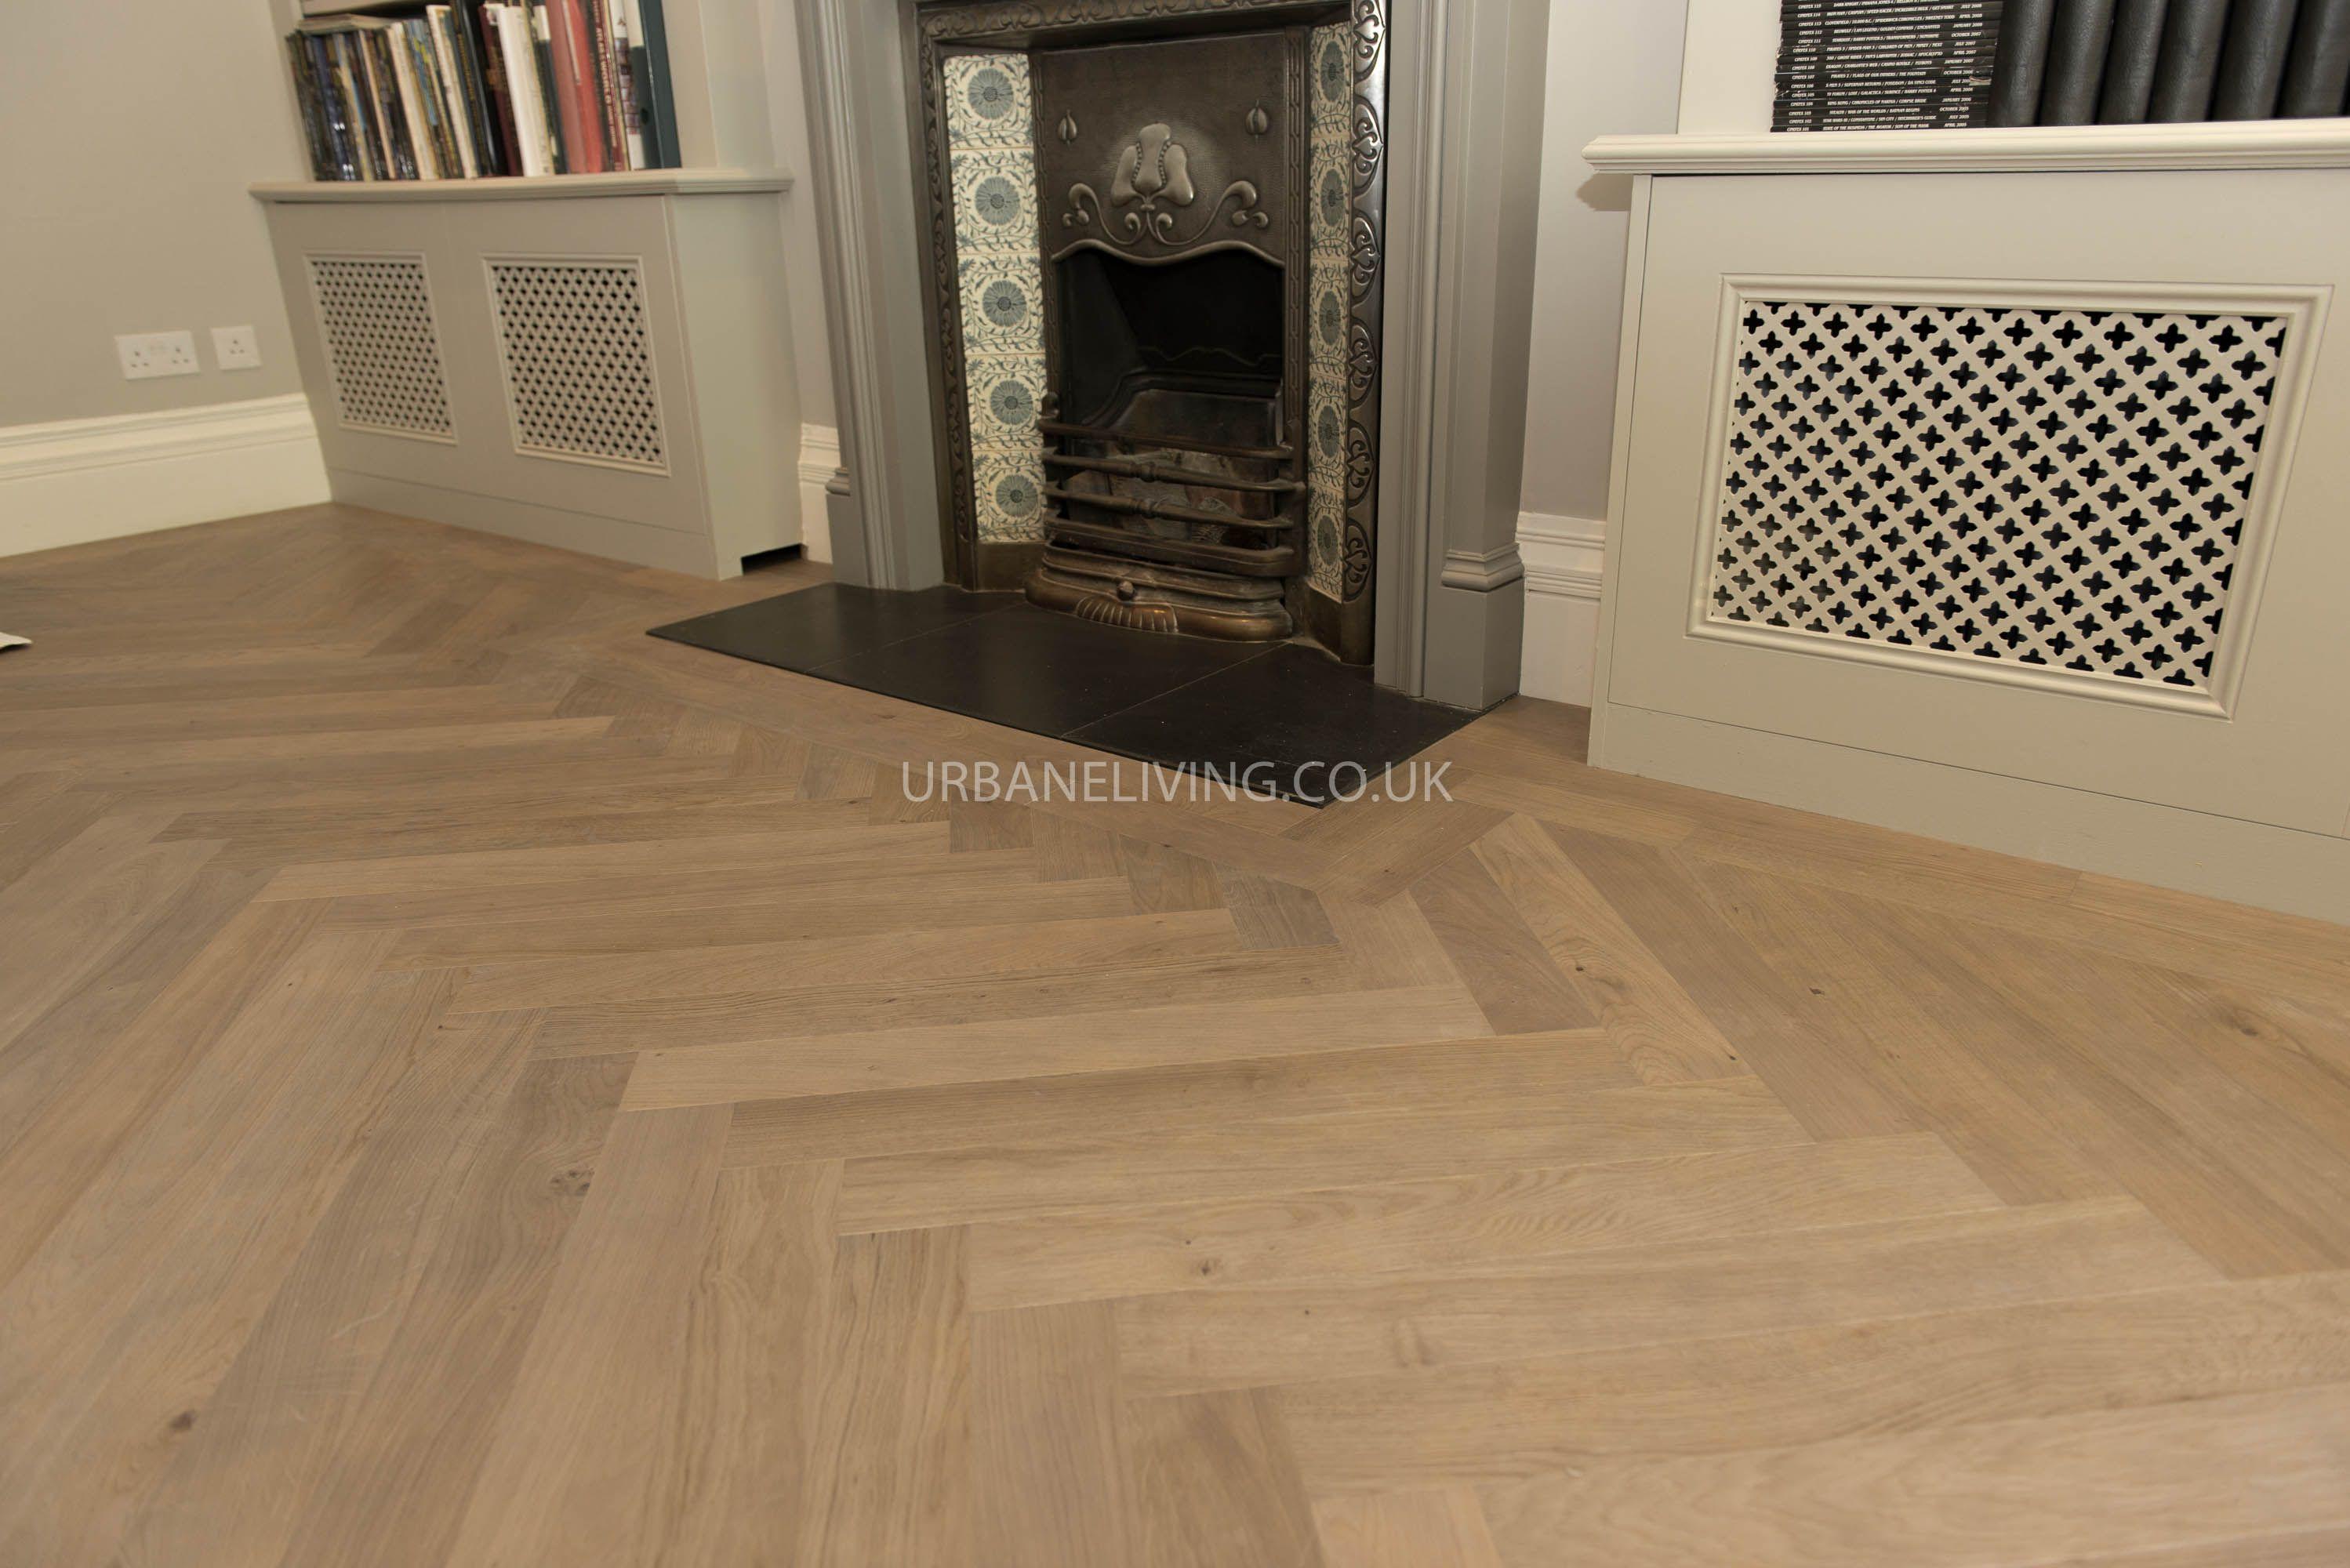 Herringbone wood flooring with 2 line border around fire